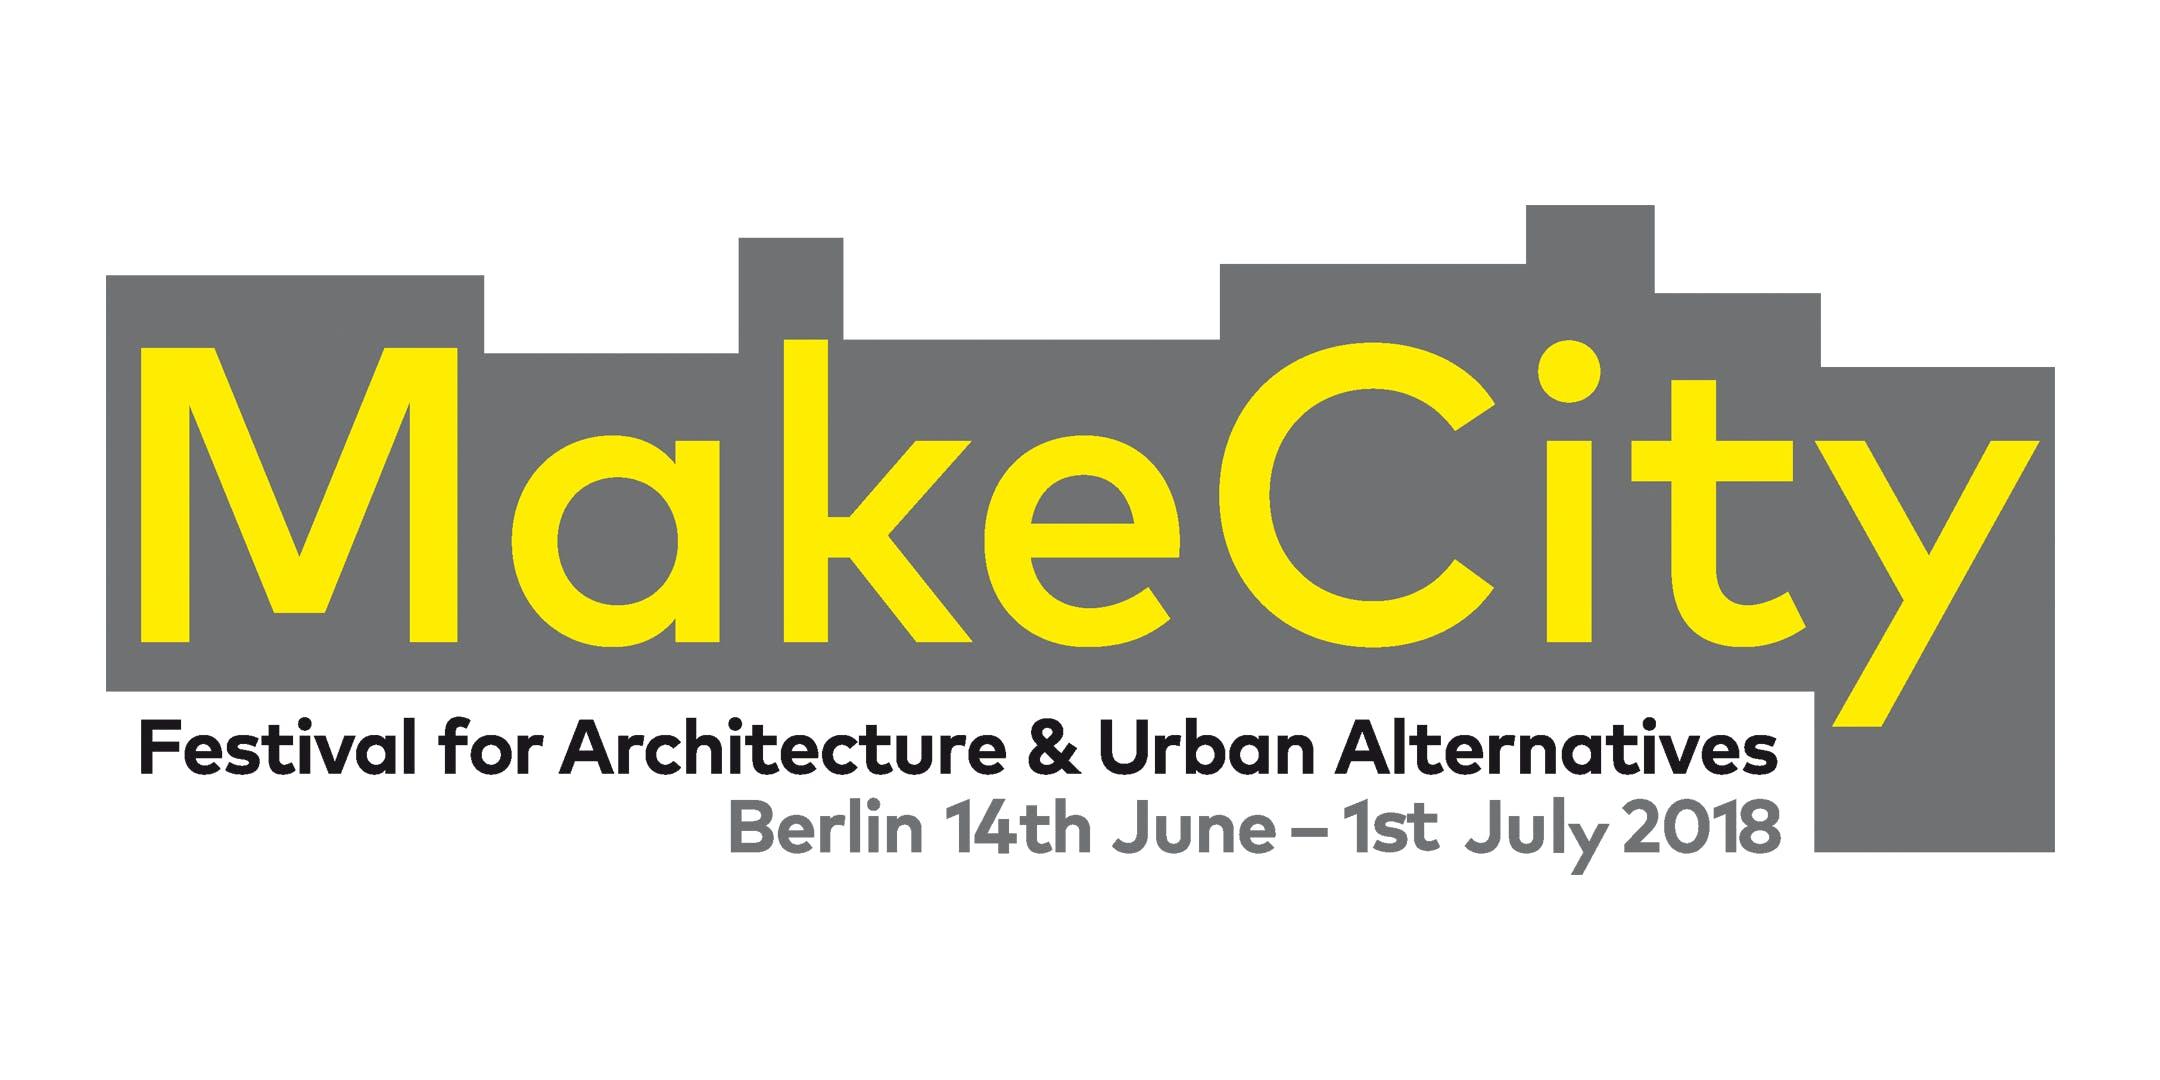 Flussbad Berlin: idea, vision, protagonists